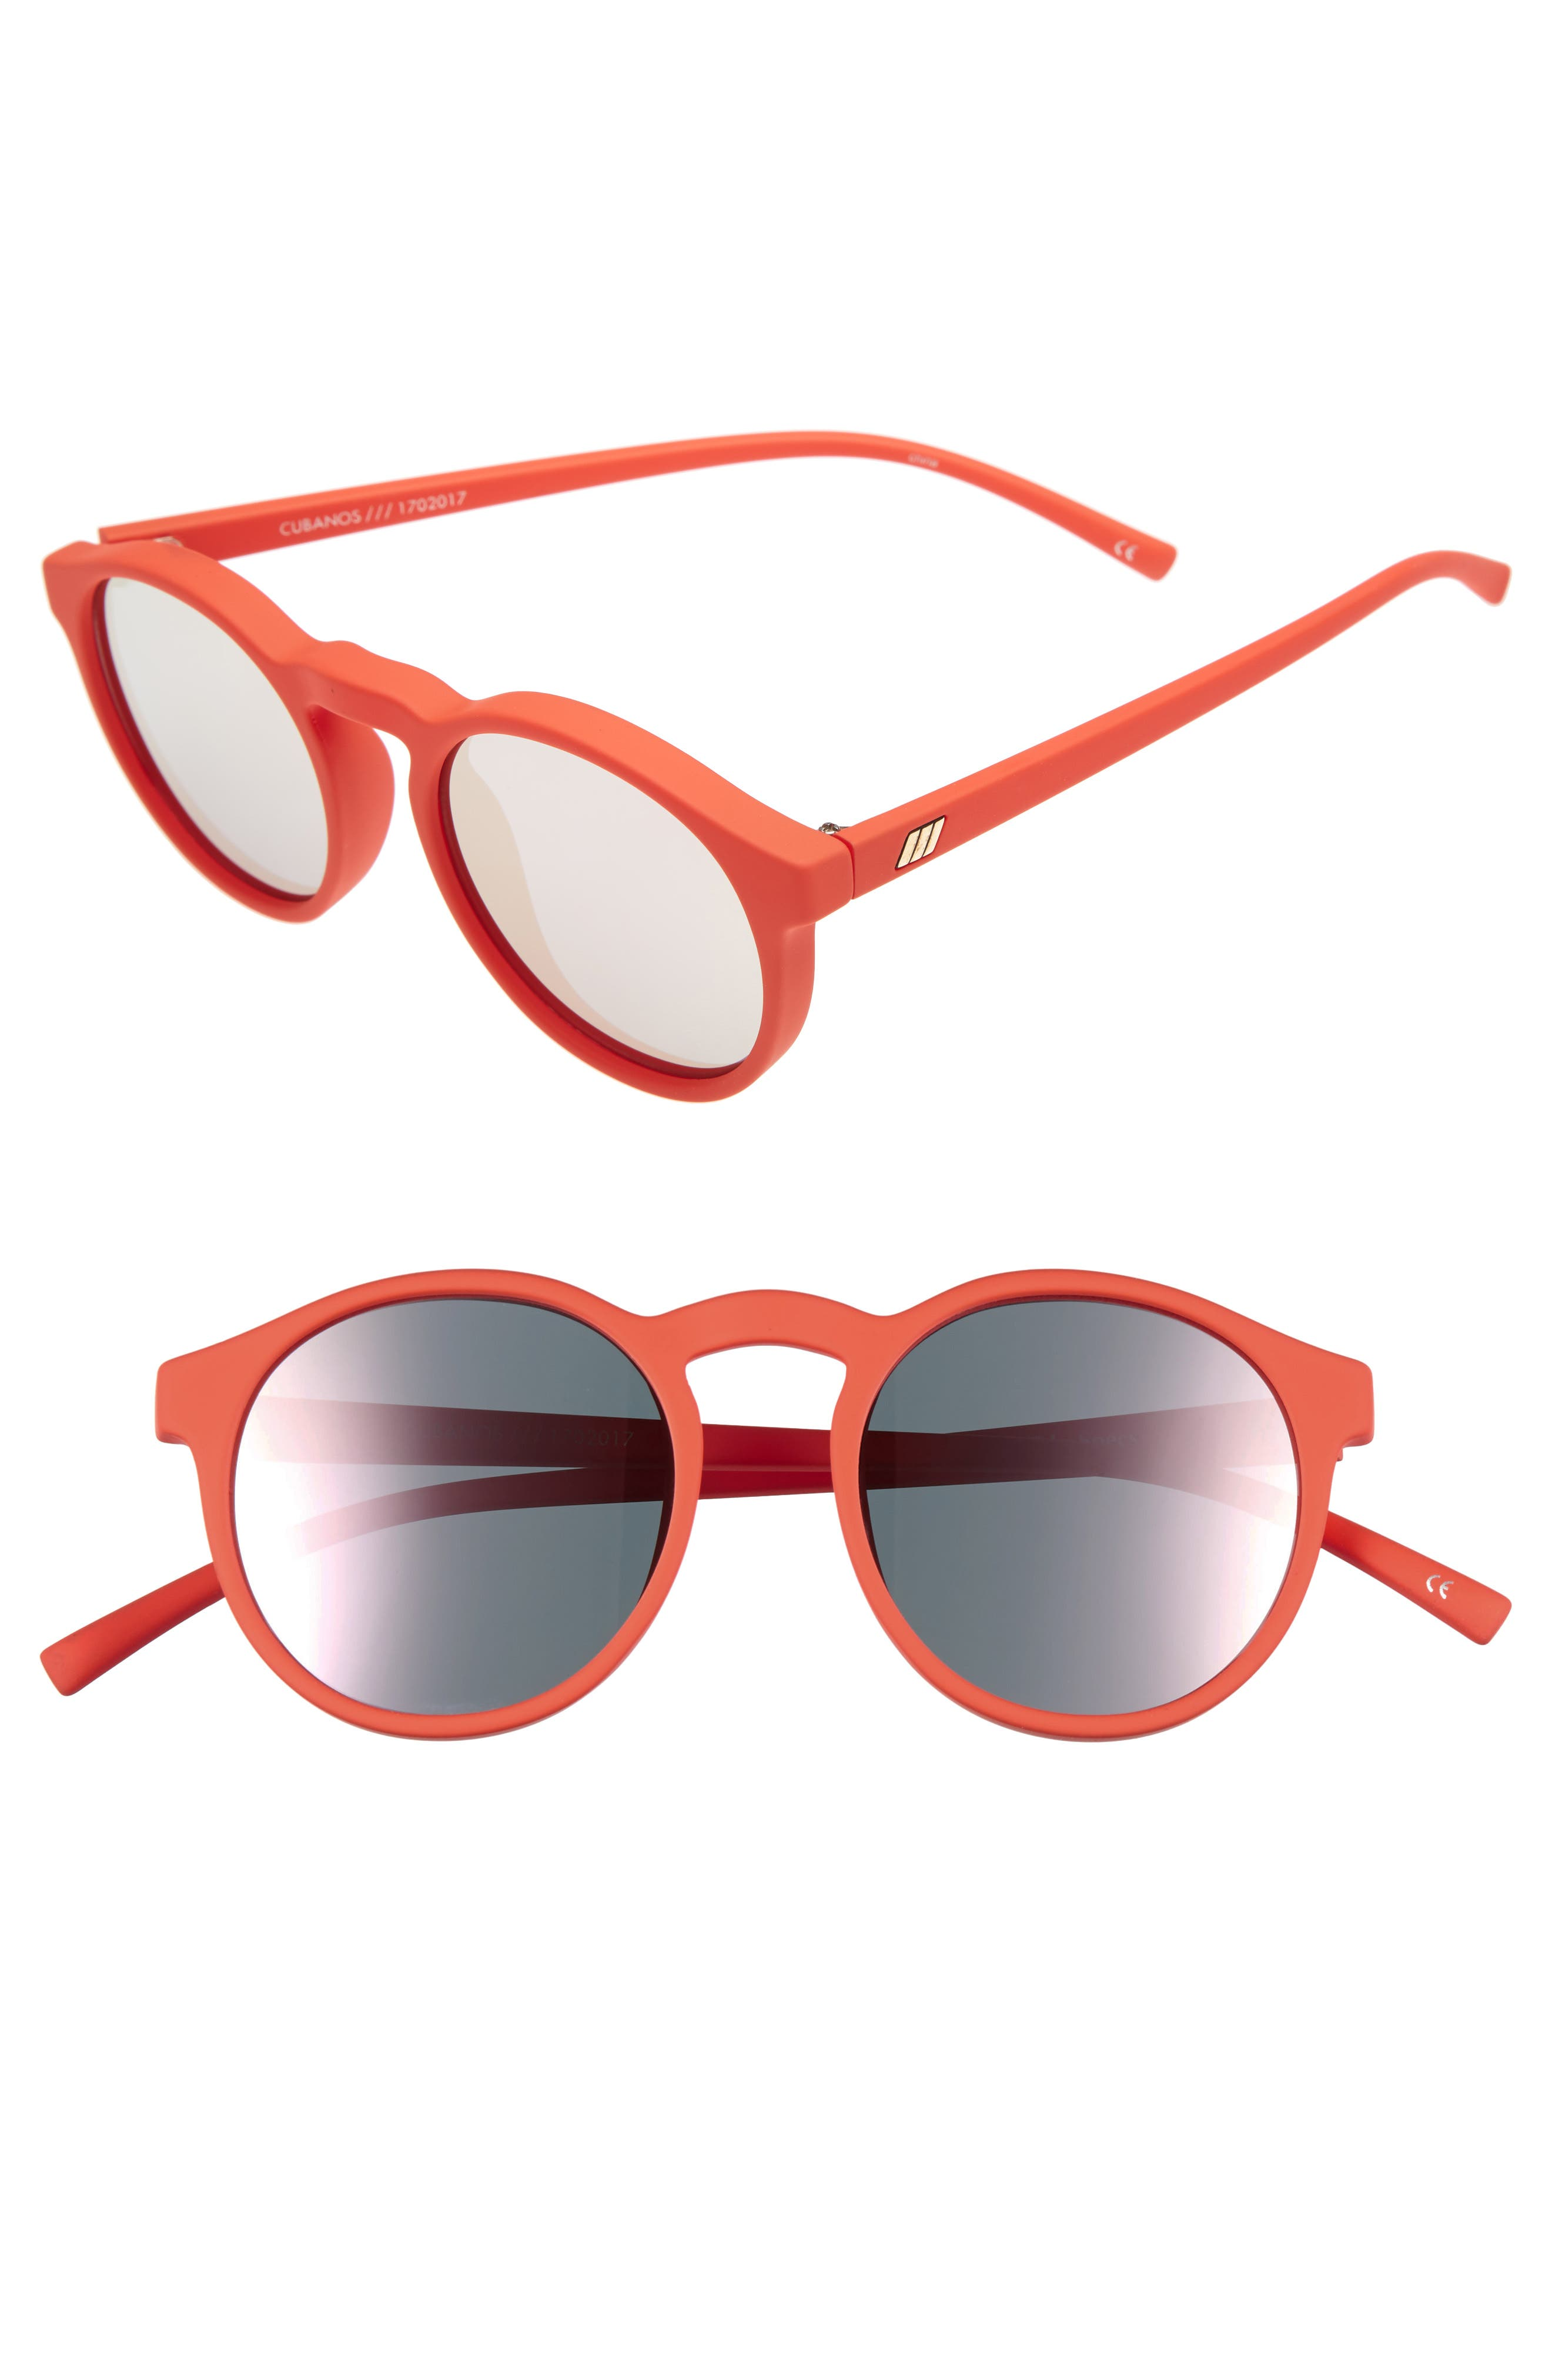 Main Image - Le Specs Cubanos 47mm Round Sunglasses